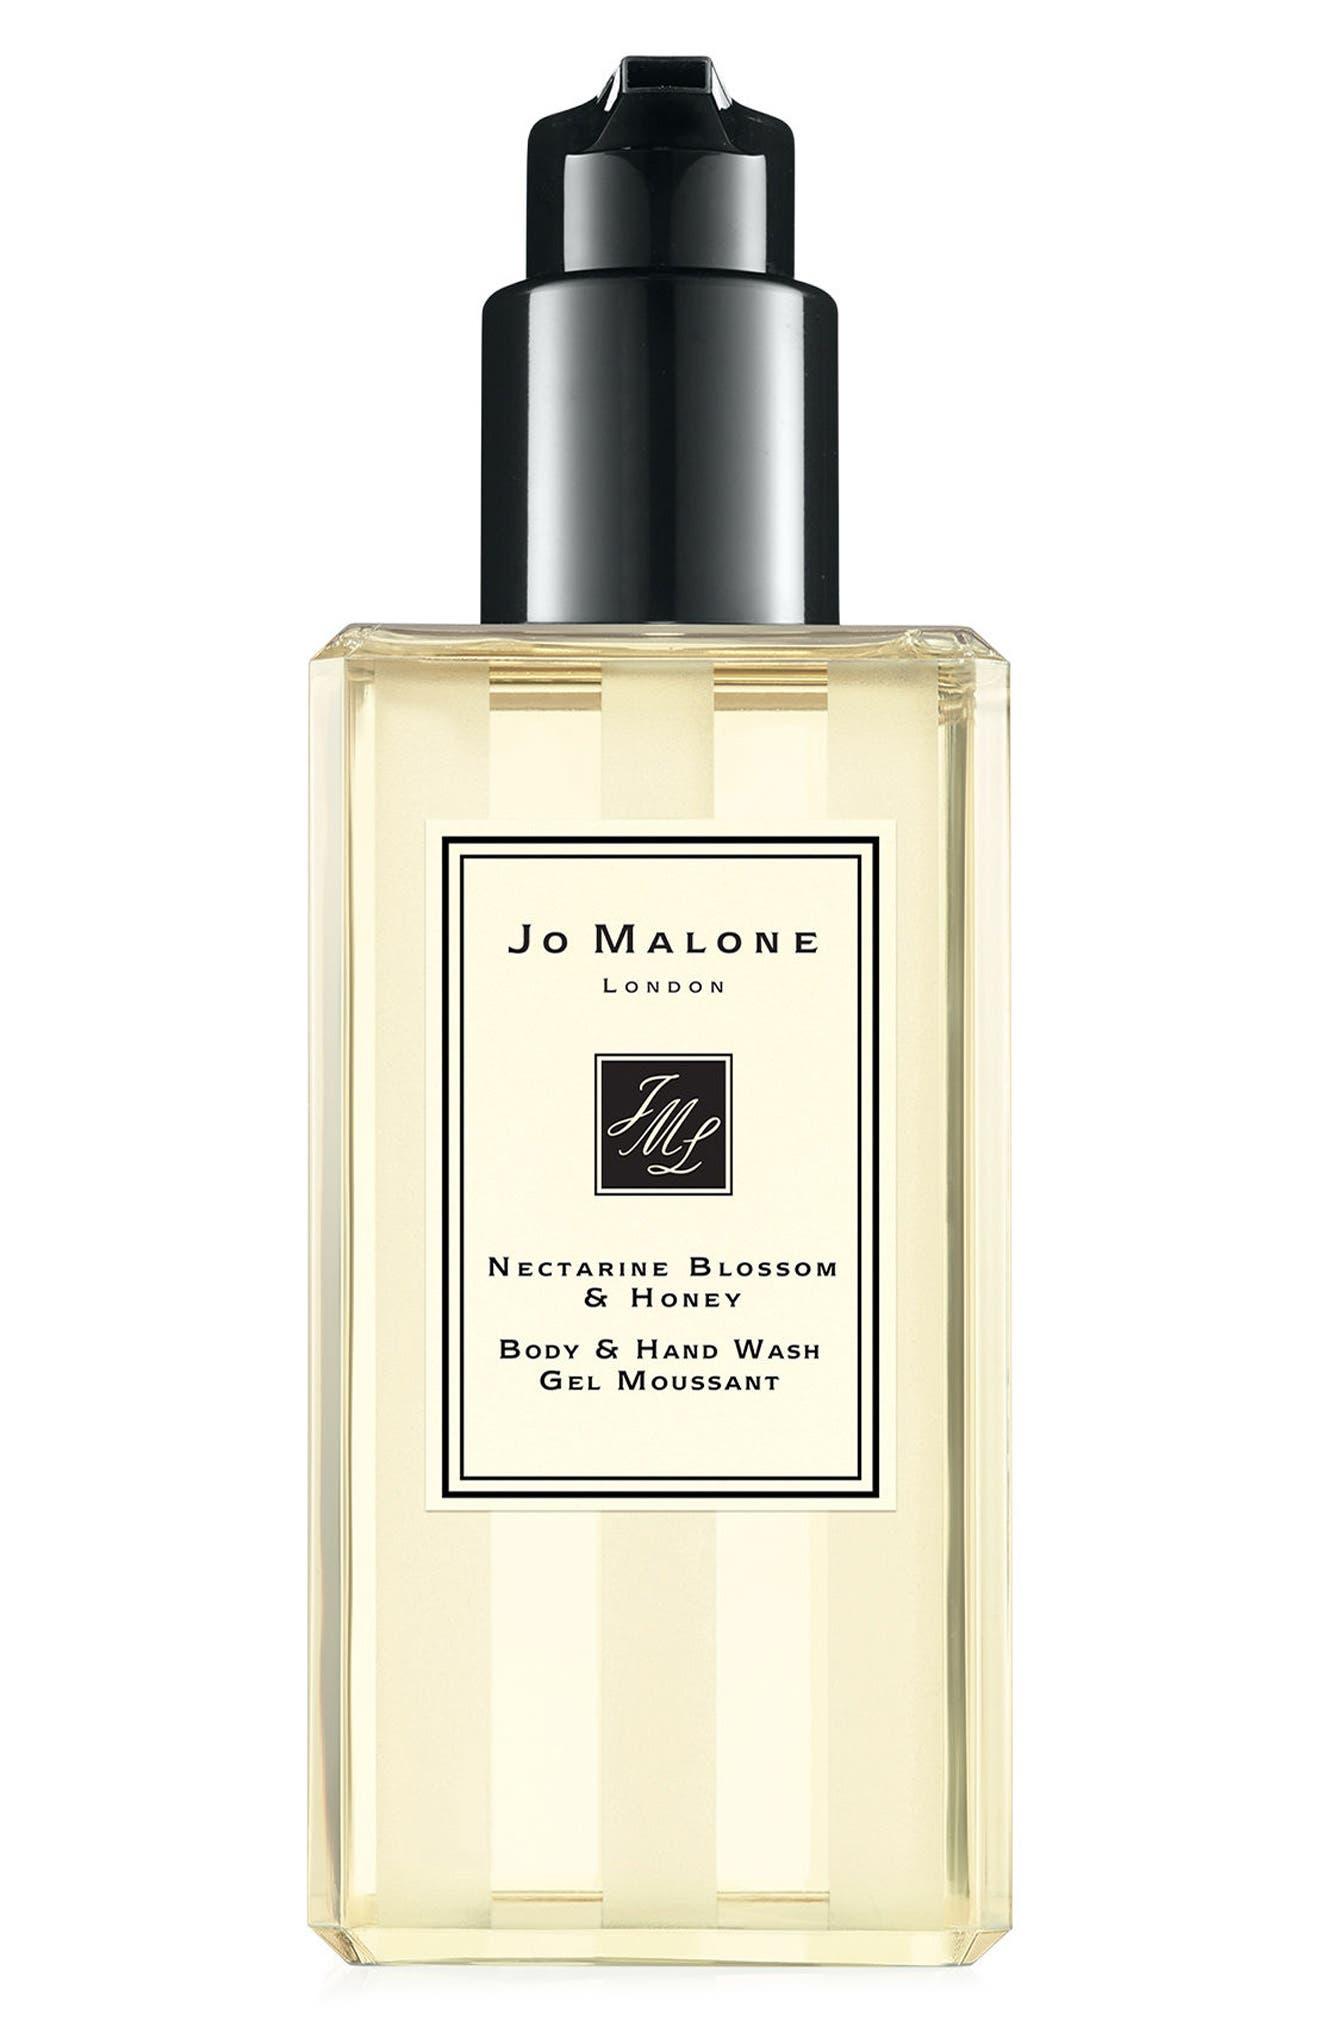 Jo Malone London™ 'Nectarine Blossom & Honey' Body & Hand Wash